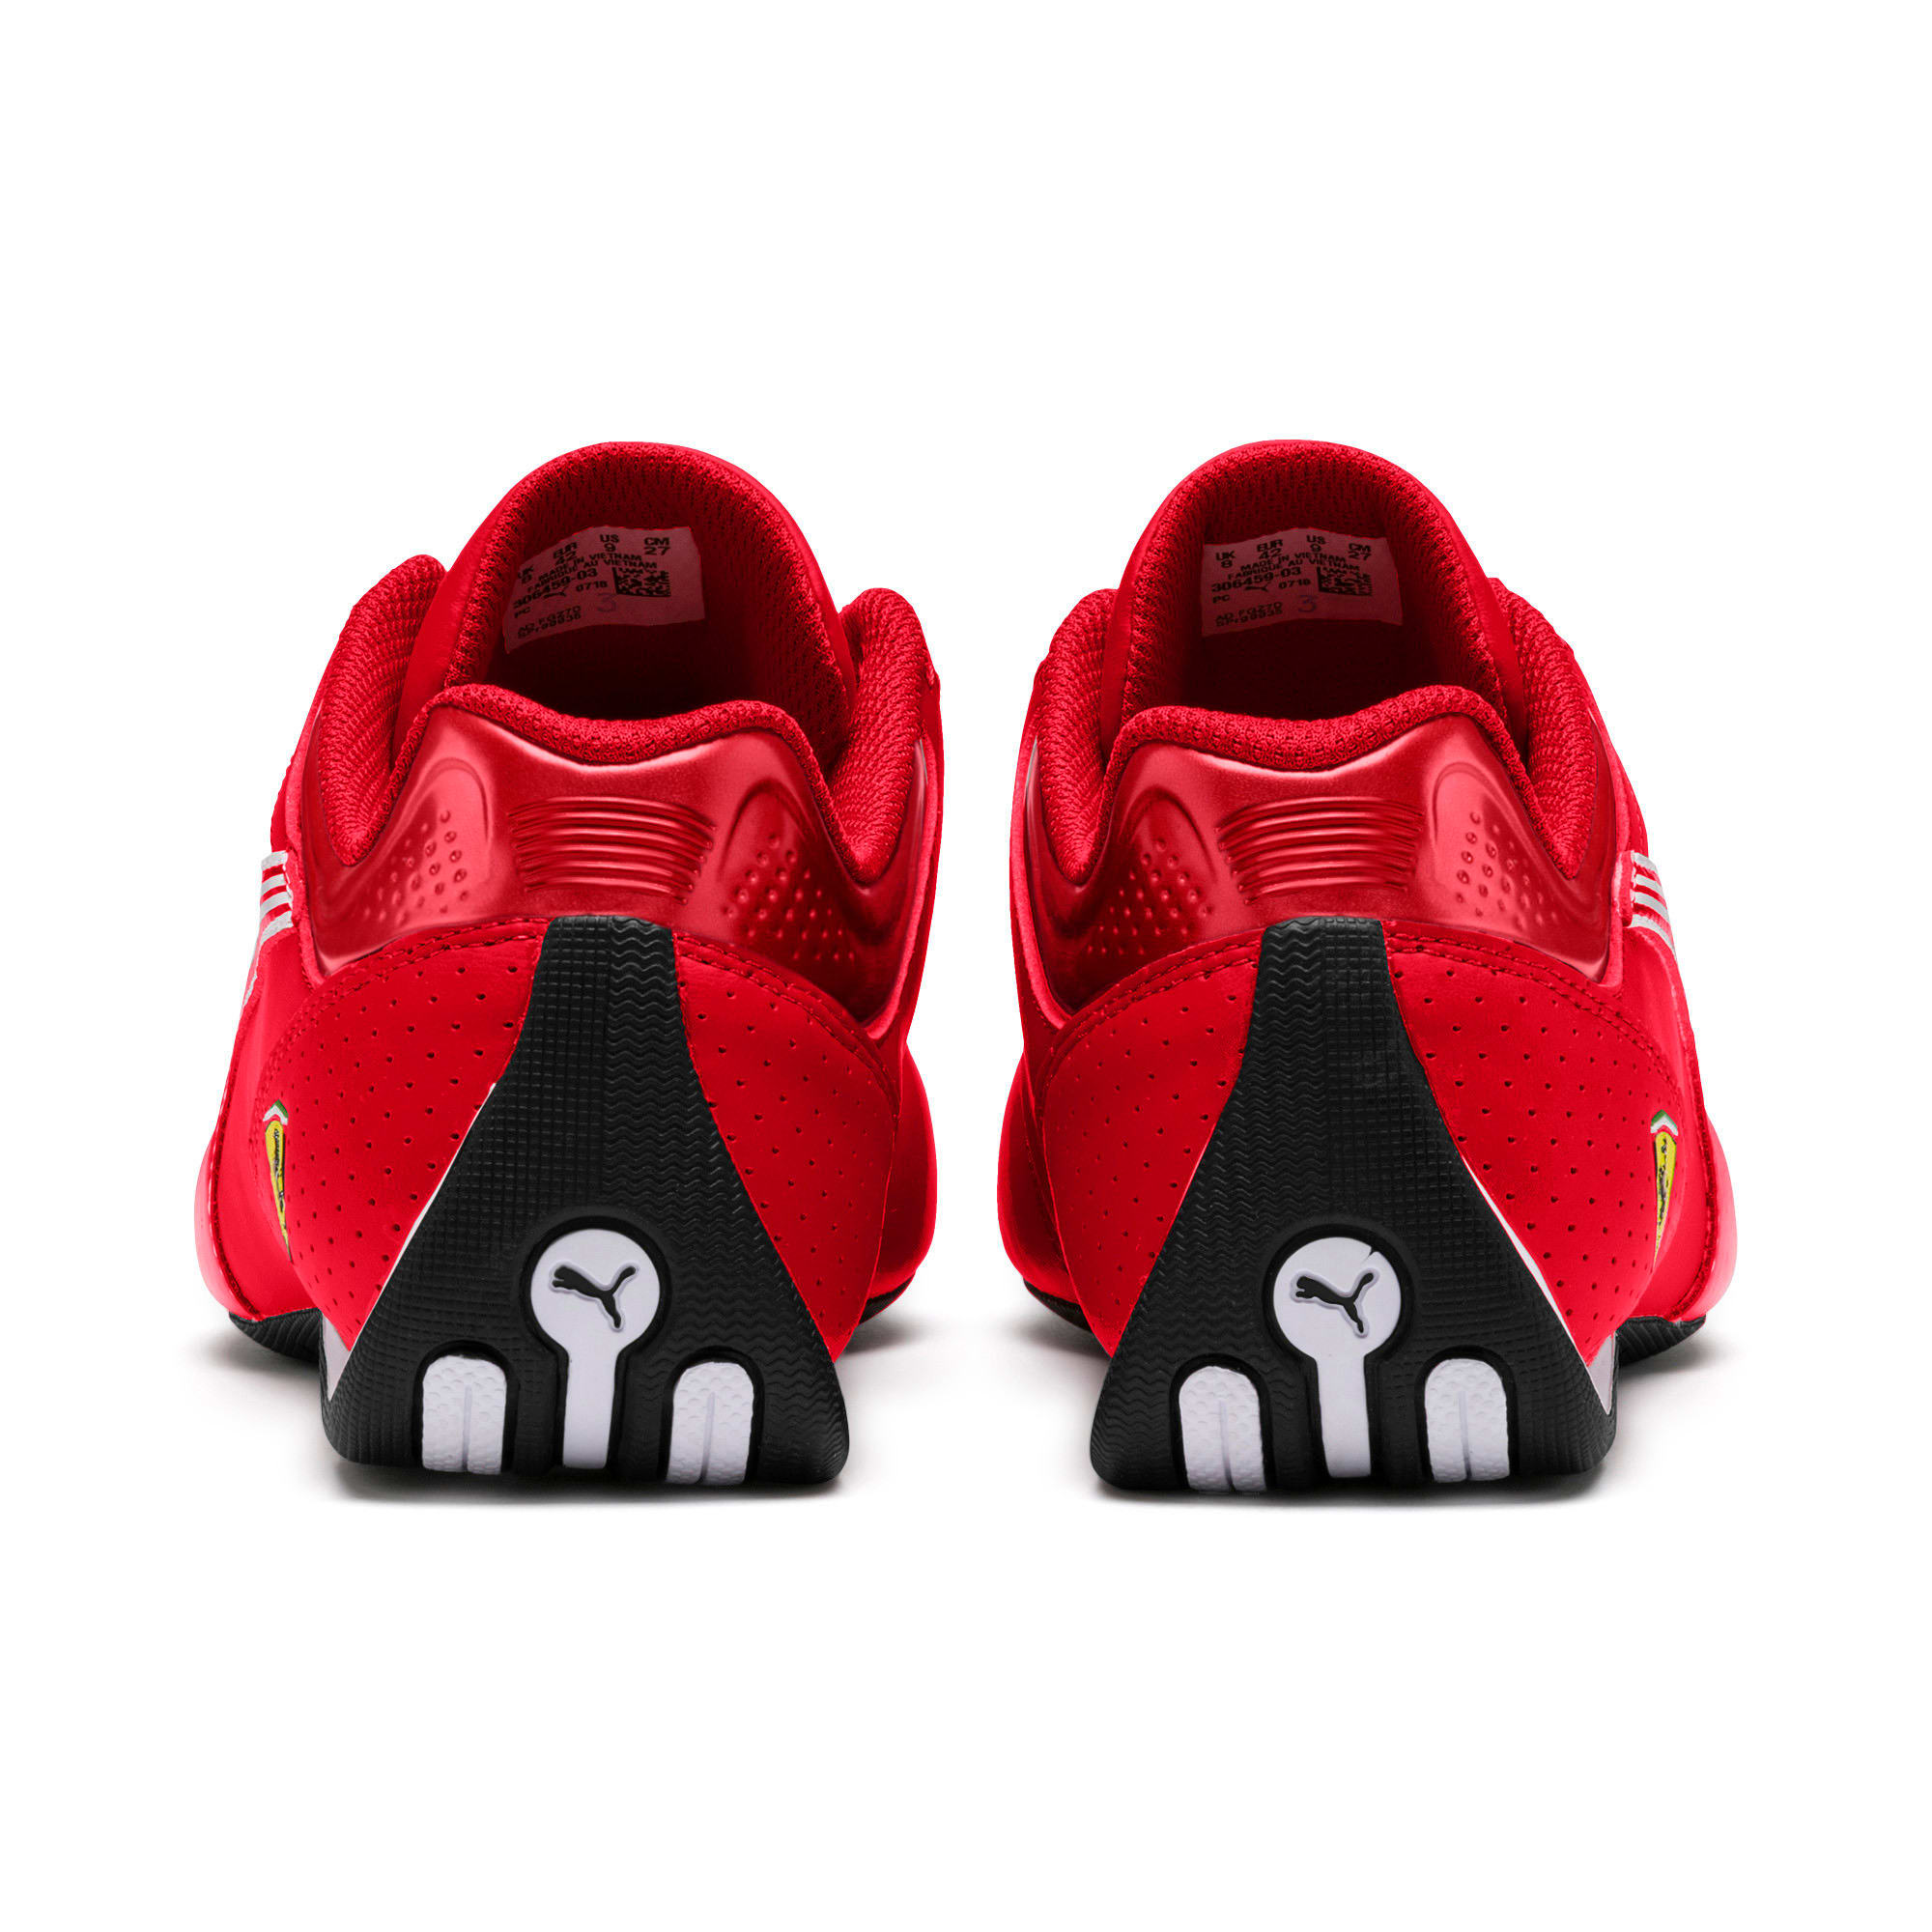 Miniatura 4 de ZapatosScuderiaFerrariFuture Kart Cat, Rosso Corsa-Puma Black, mediano